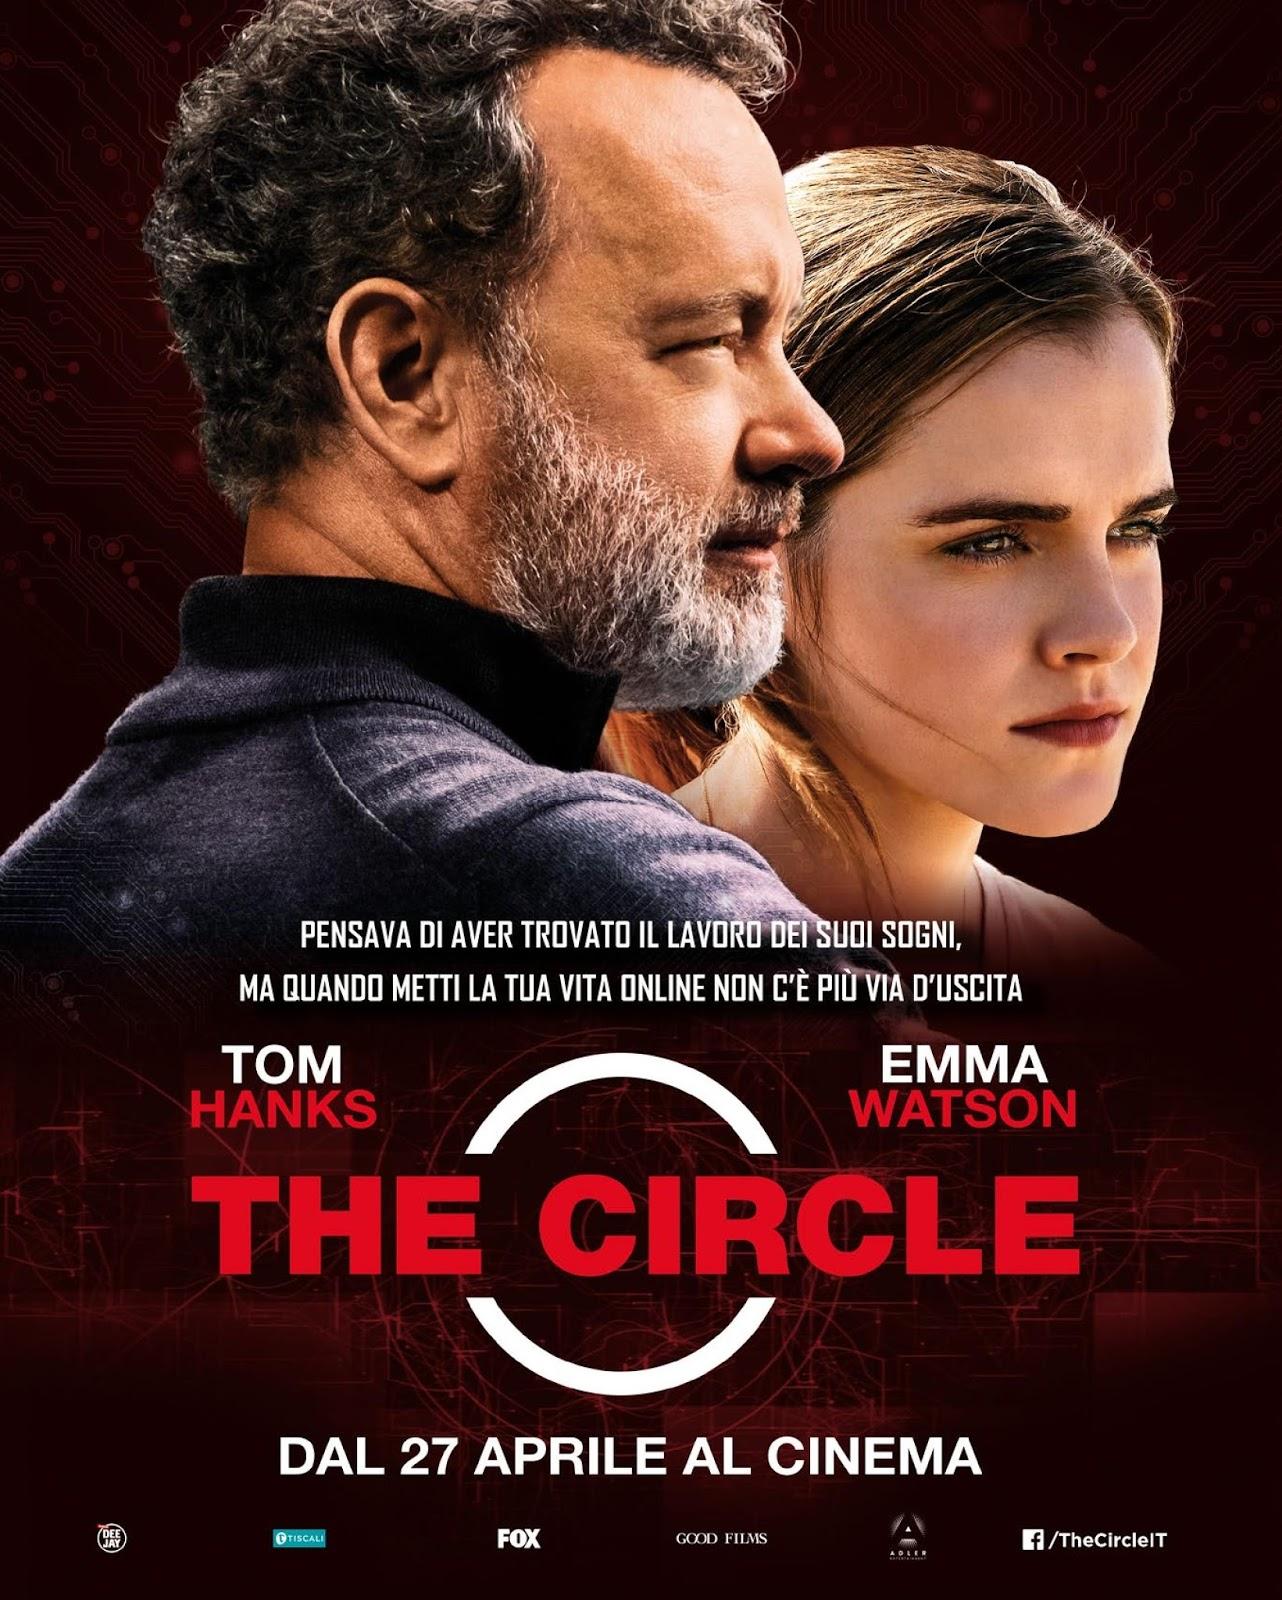 1 CIRCLE269 CIRCLEBest%2BMovie%2B%2BAprile%2B2017 page 001 - The Circle 2017 English 700MB HDTC x264